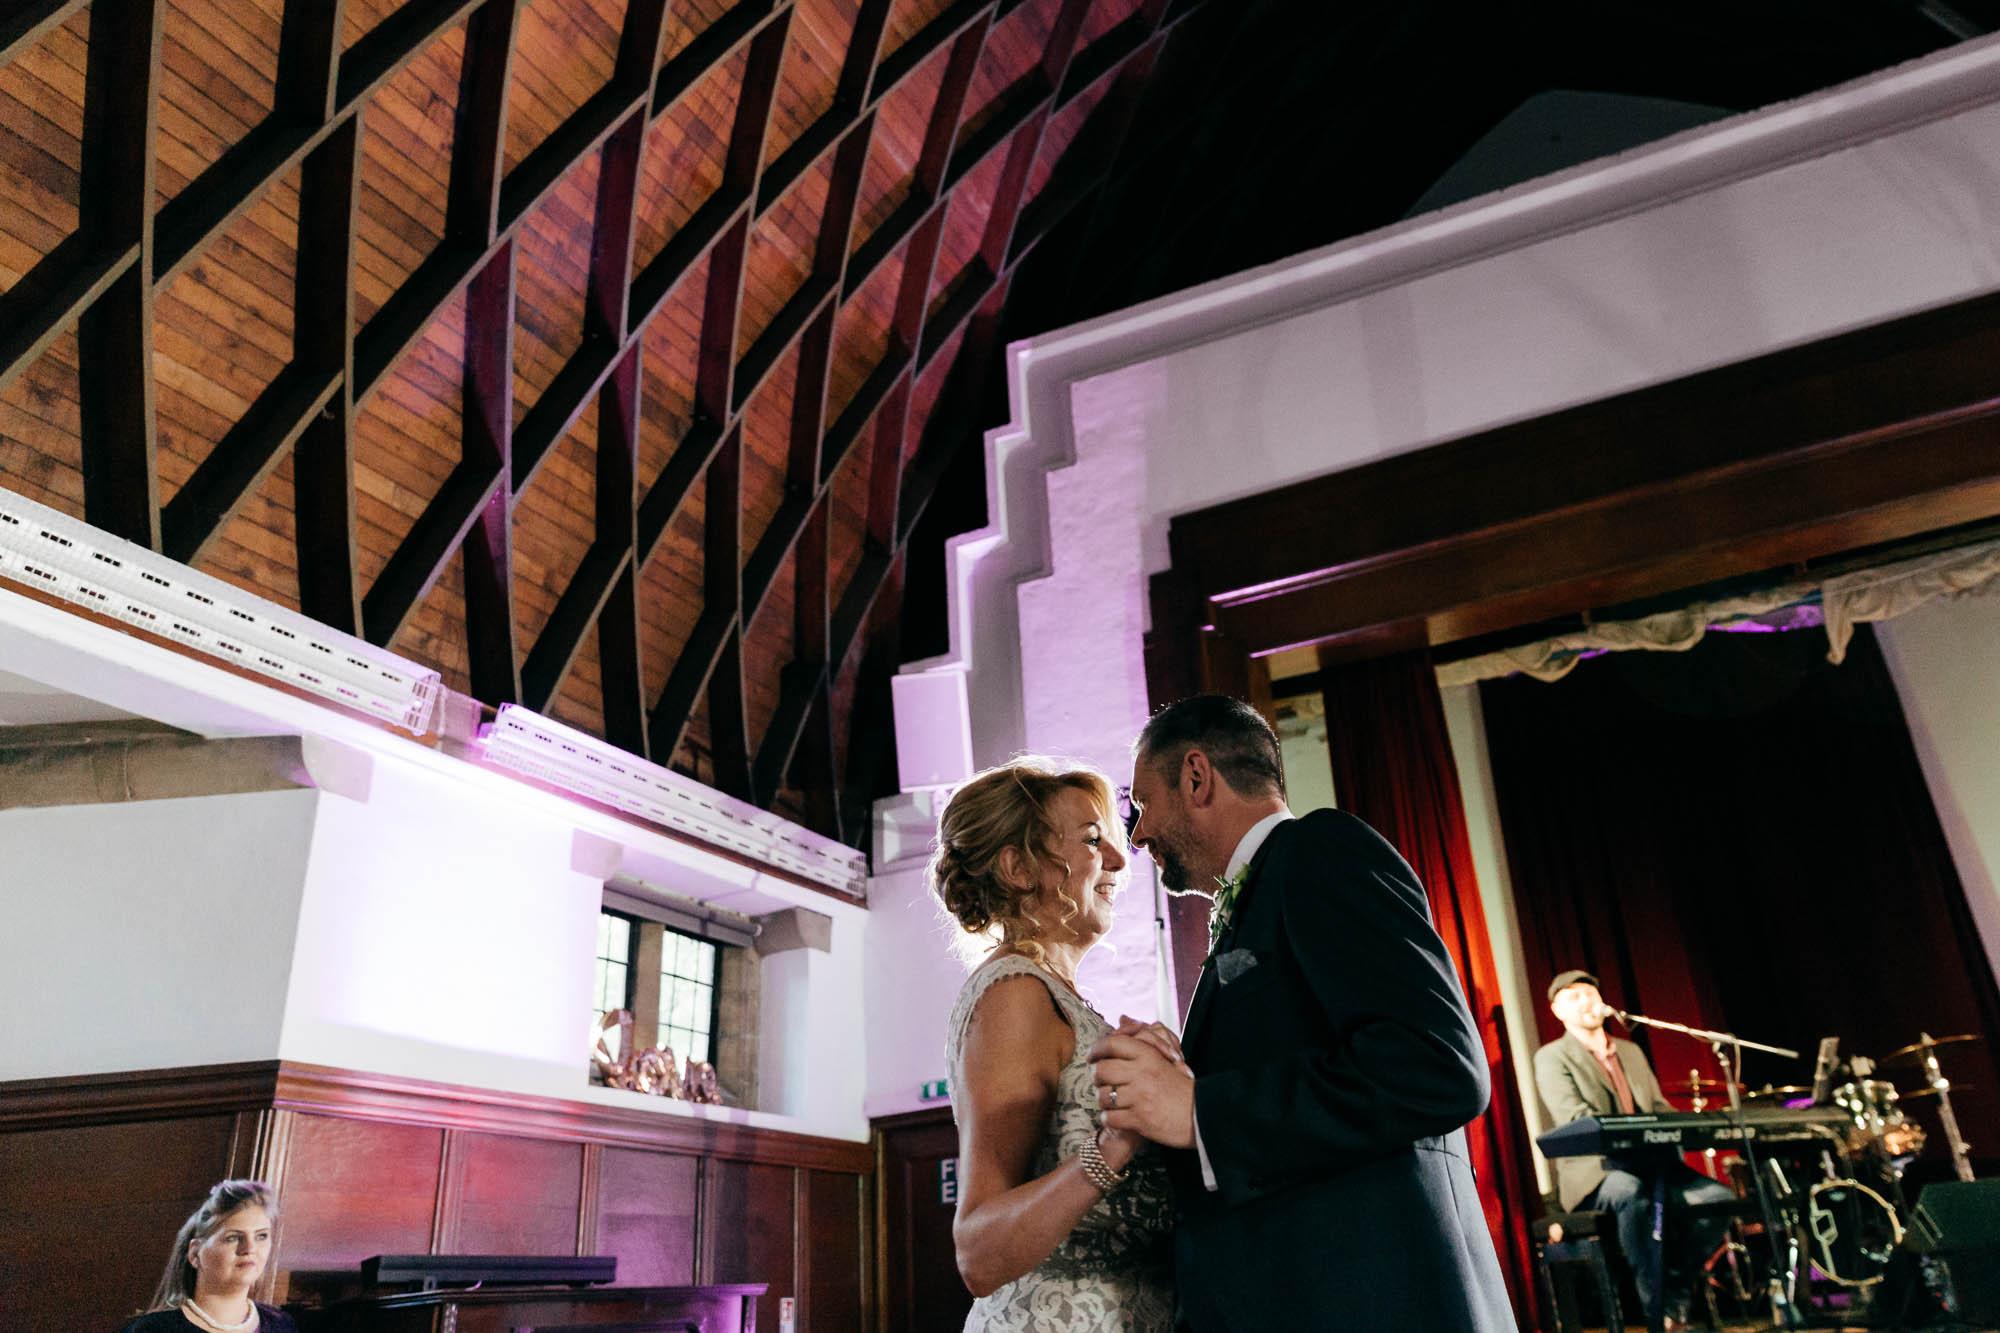 Gloucestershire wedding photographer Amber Marie Photography